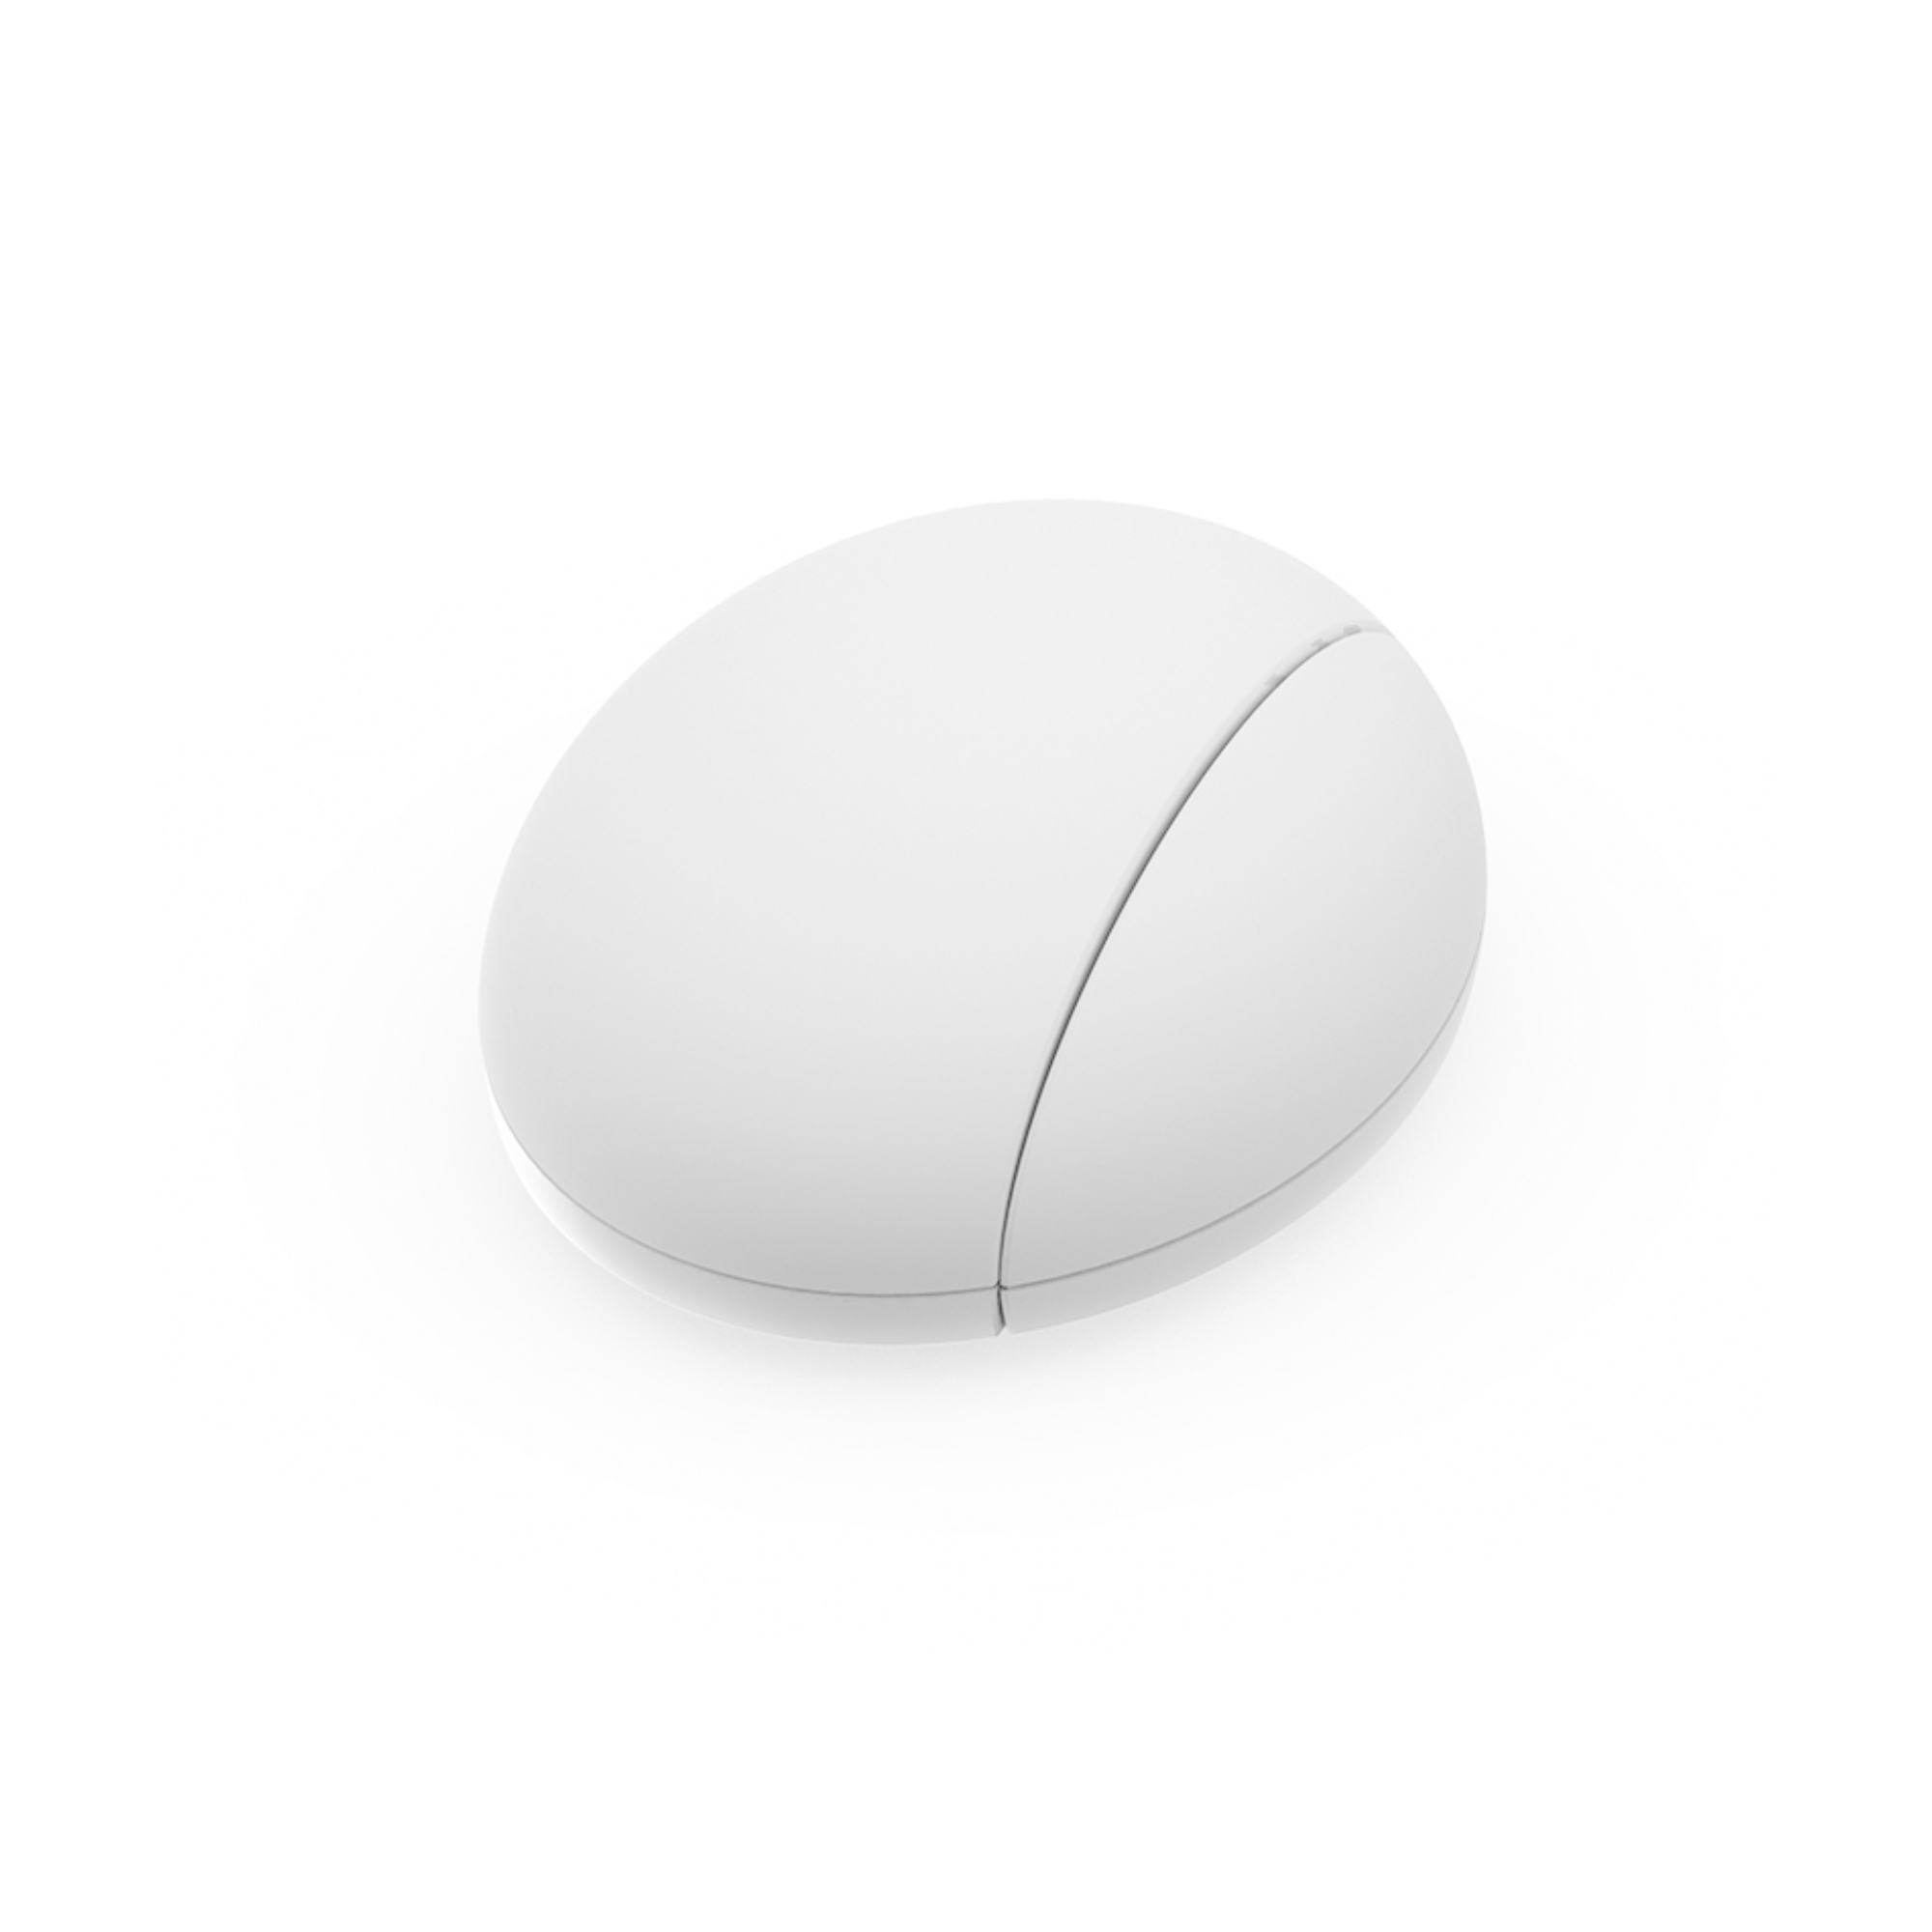 Sensref Bluetooth Tabanlı Yuvarlak Manyetik Kapı Sensörü